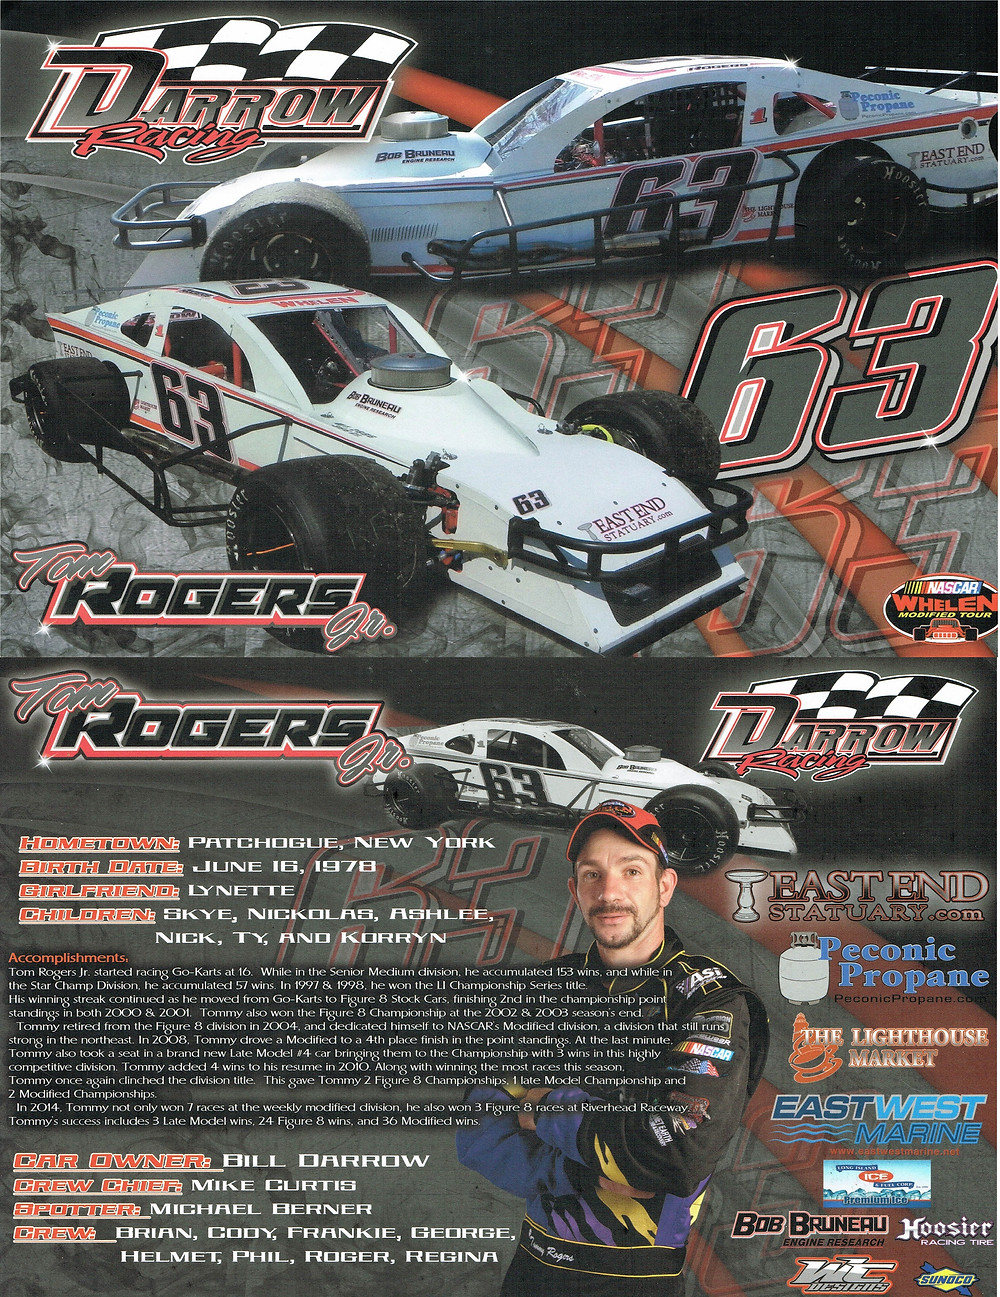 Darrow Racing - Whelen Modified Tour - #63 Tom Rogers Jr.jpg